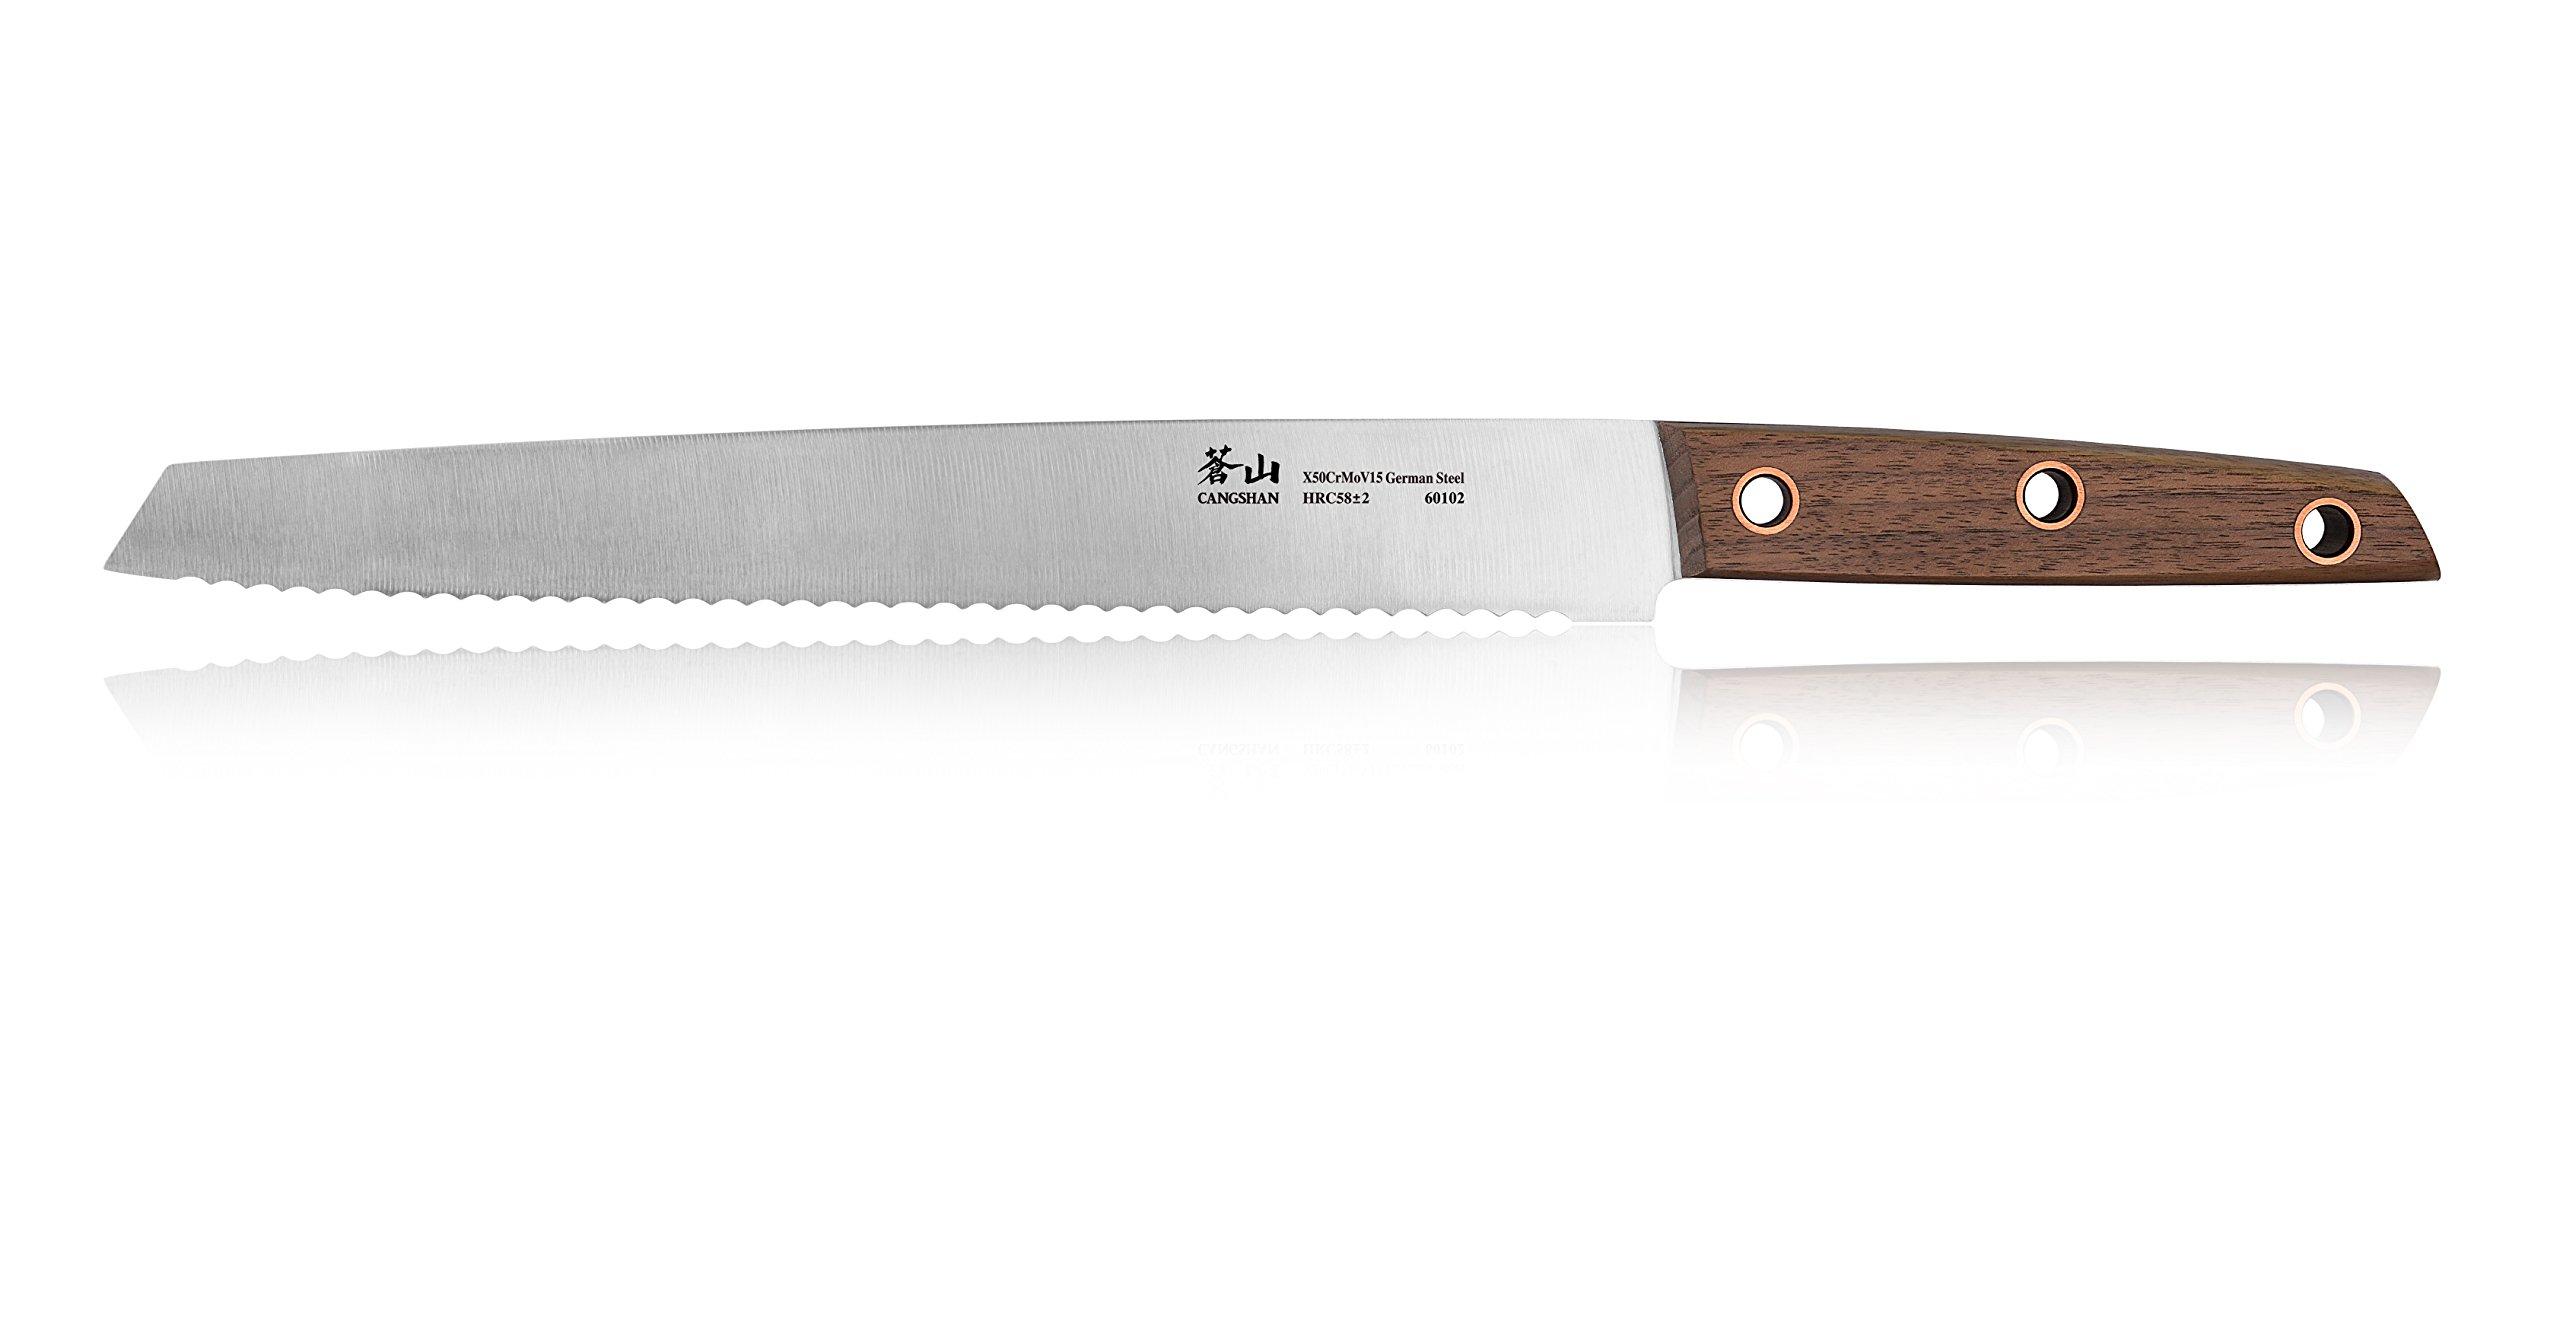 Cangshan W Series 60102 German Steel Bread Knife, 10.25'', Silver by Cangshan (Image #2)